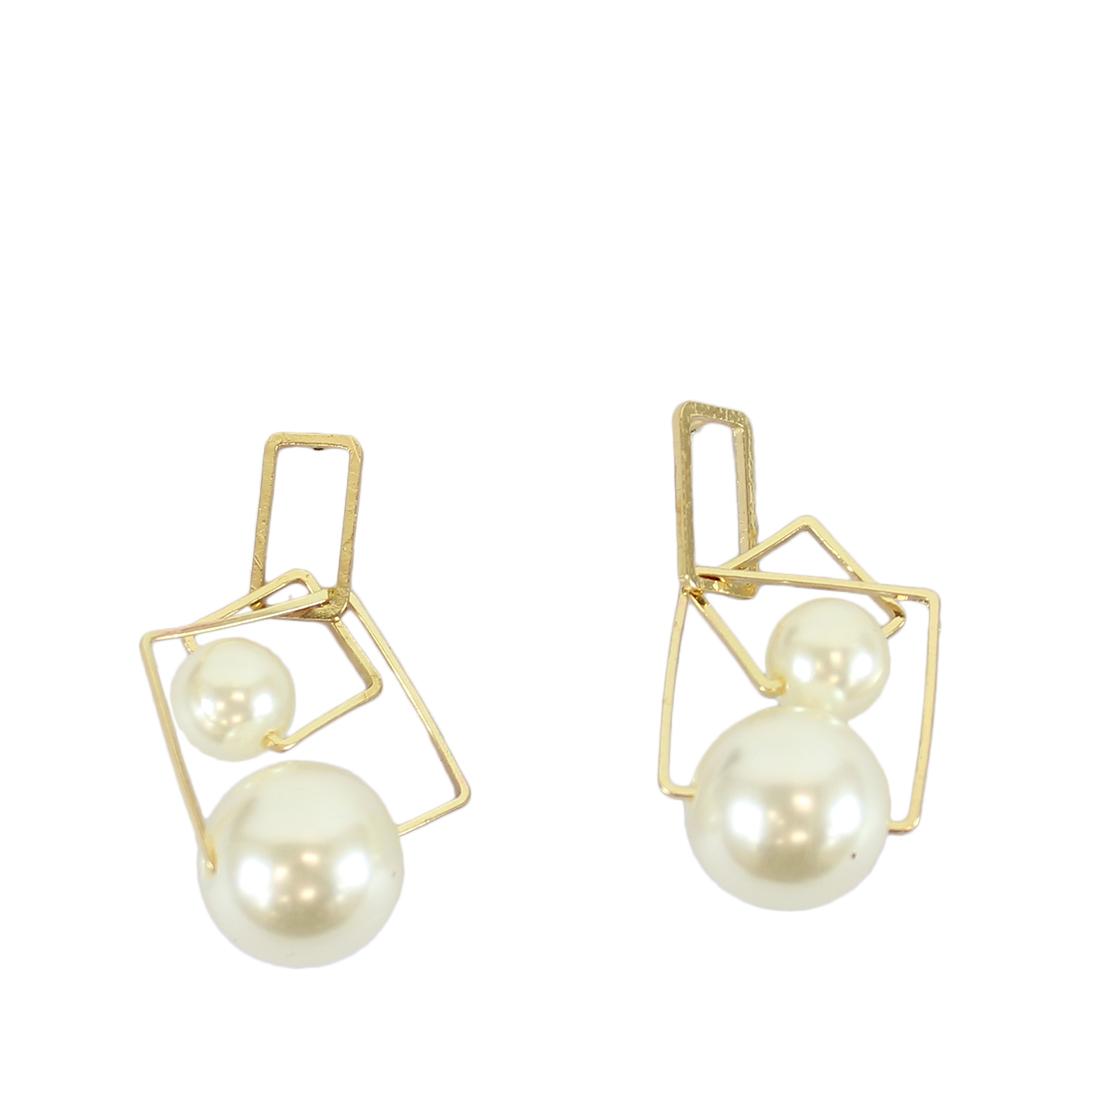 Dangle earrings with pearls